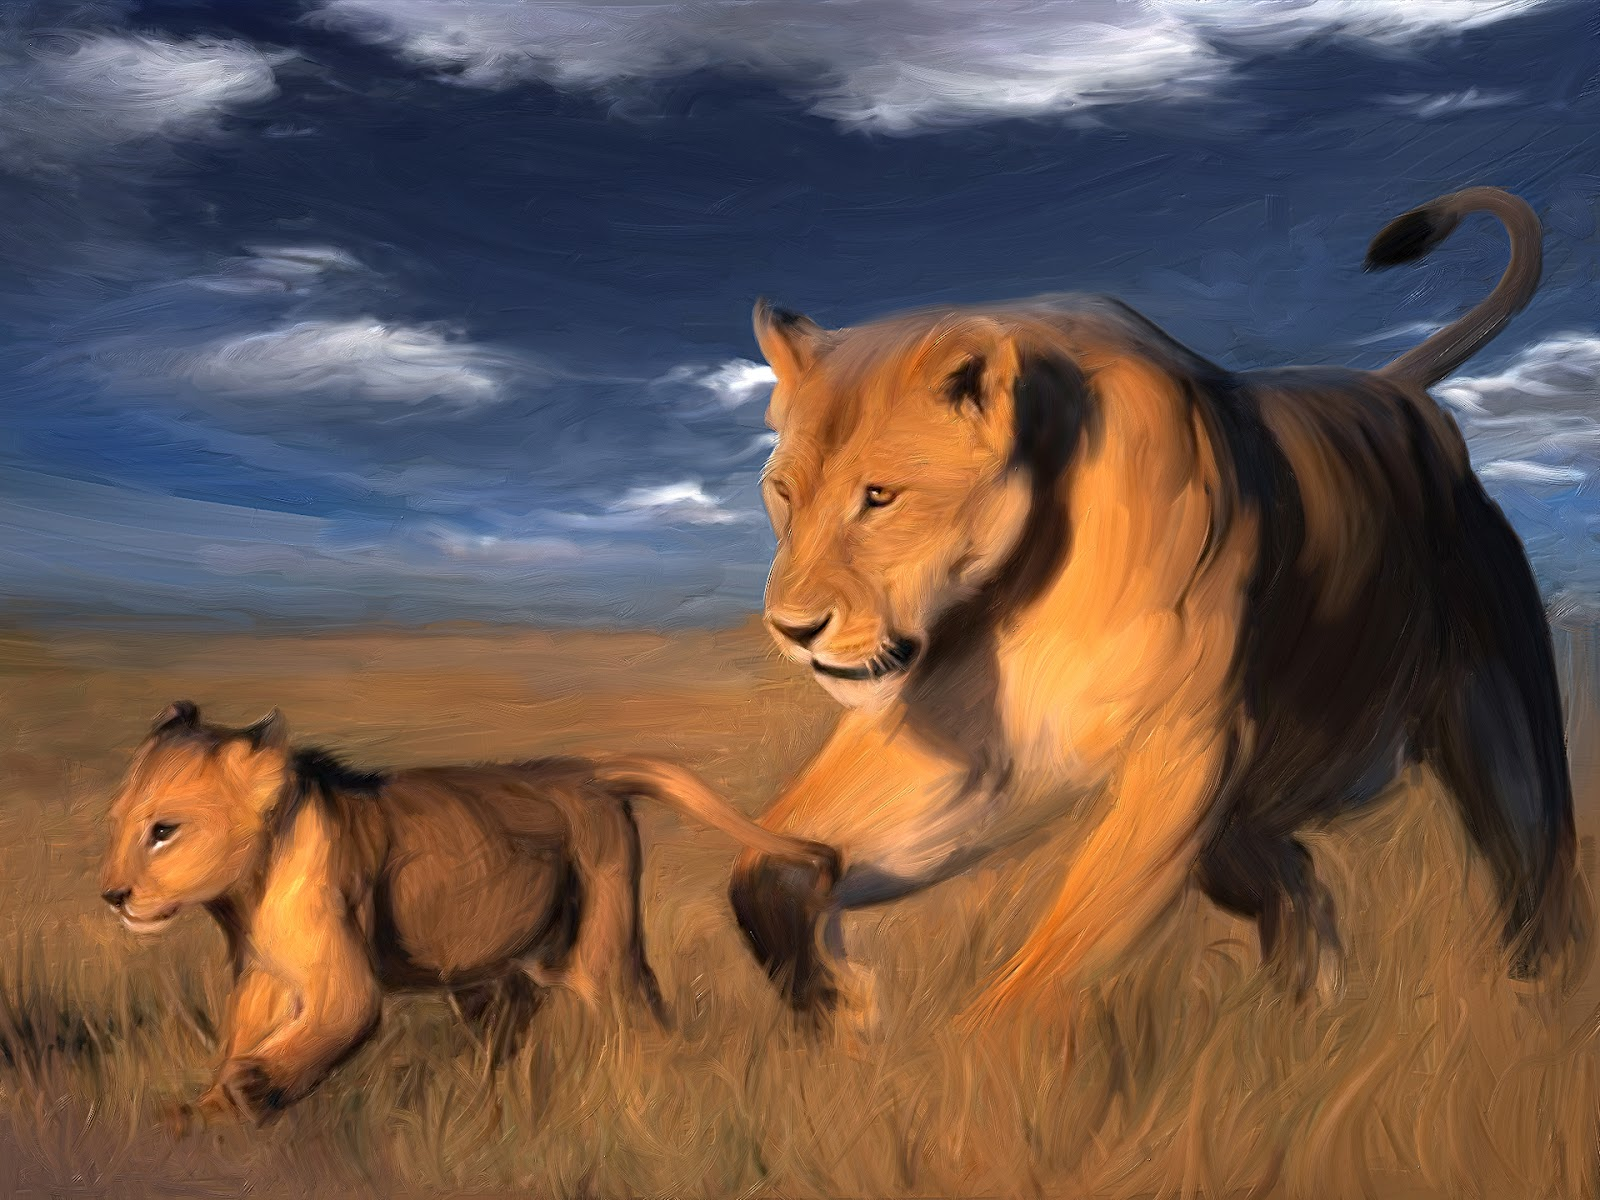 Animals Wallpapers hd beautiful animals for desktop 1600x1200